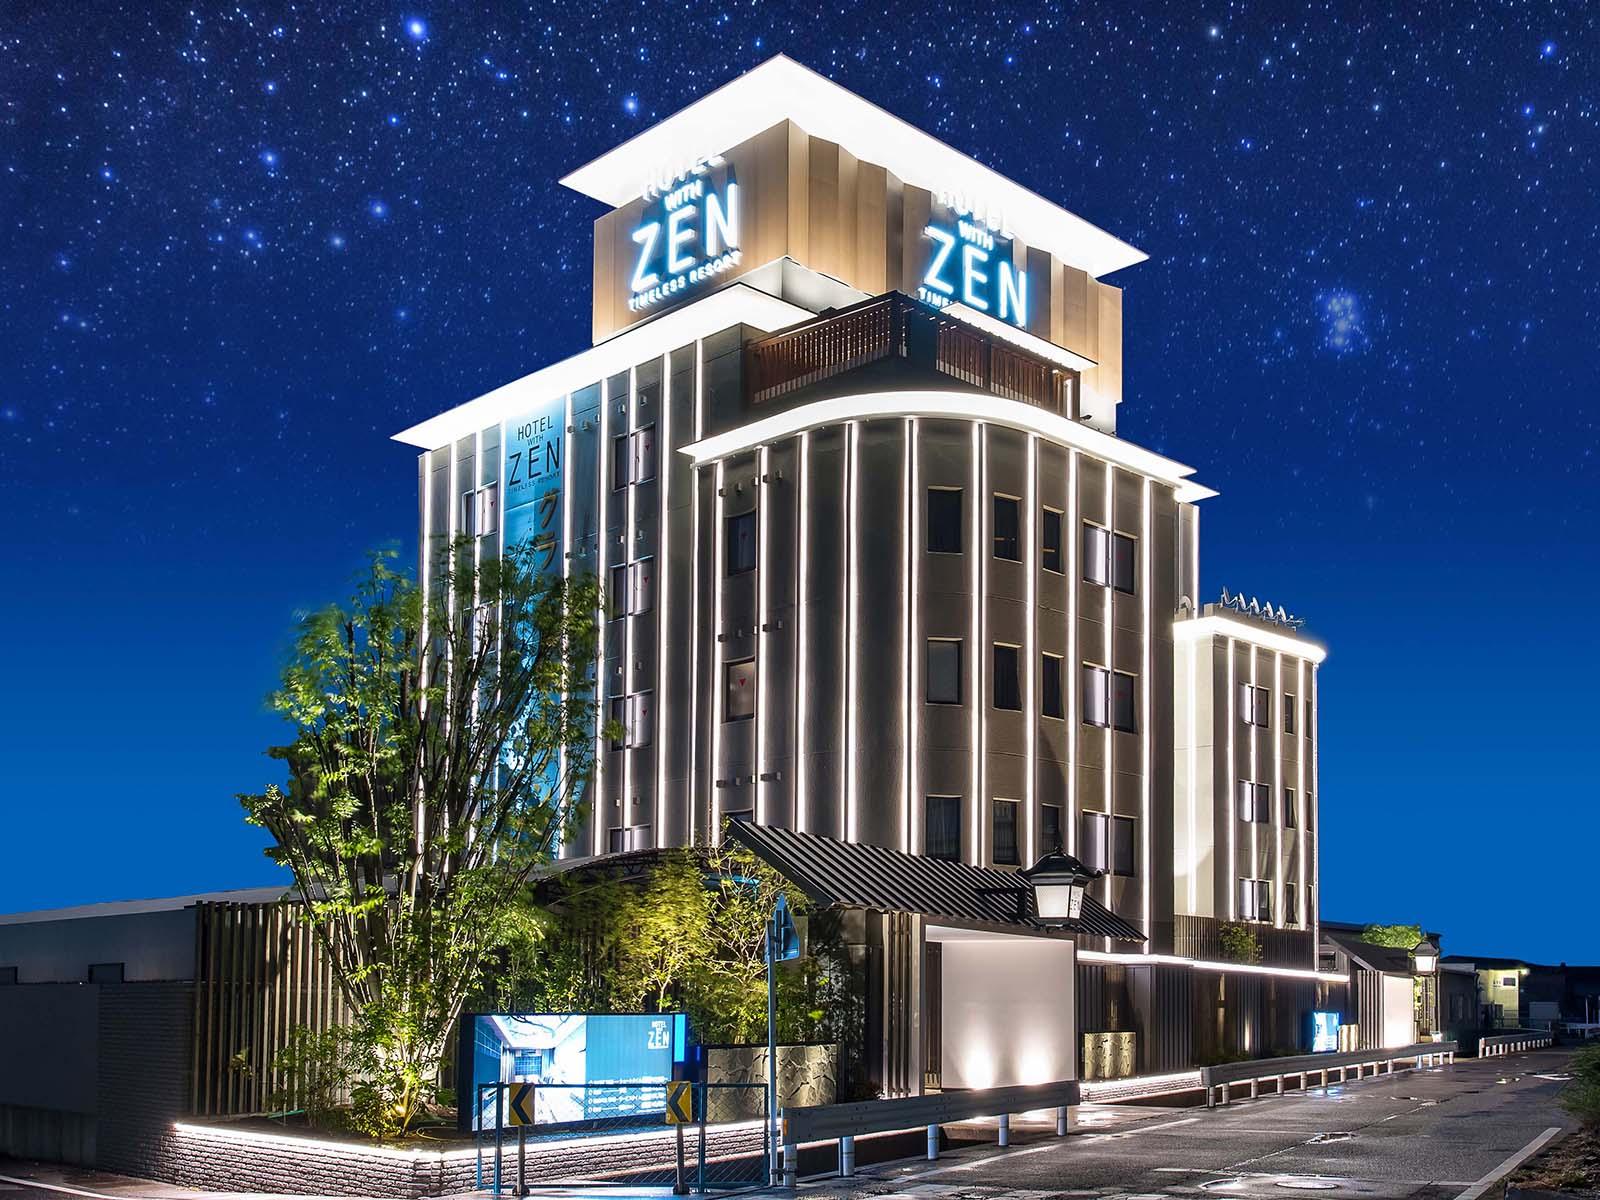 HOTEL ZEN 一宮